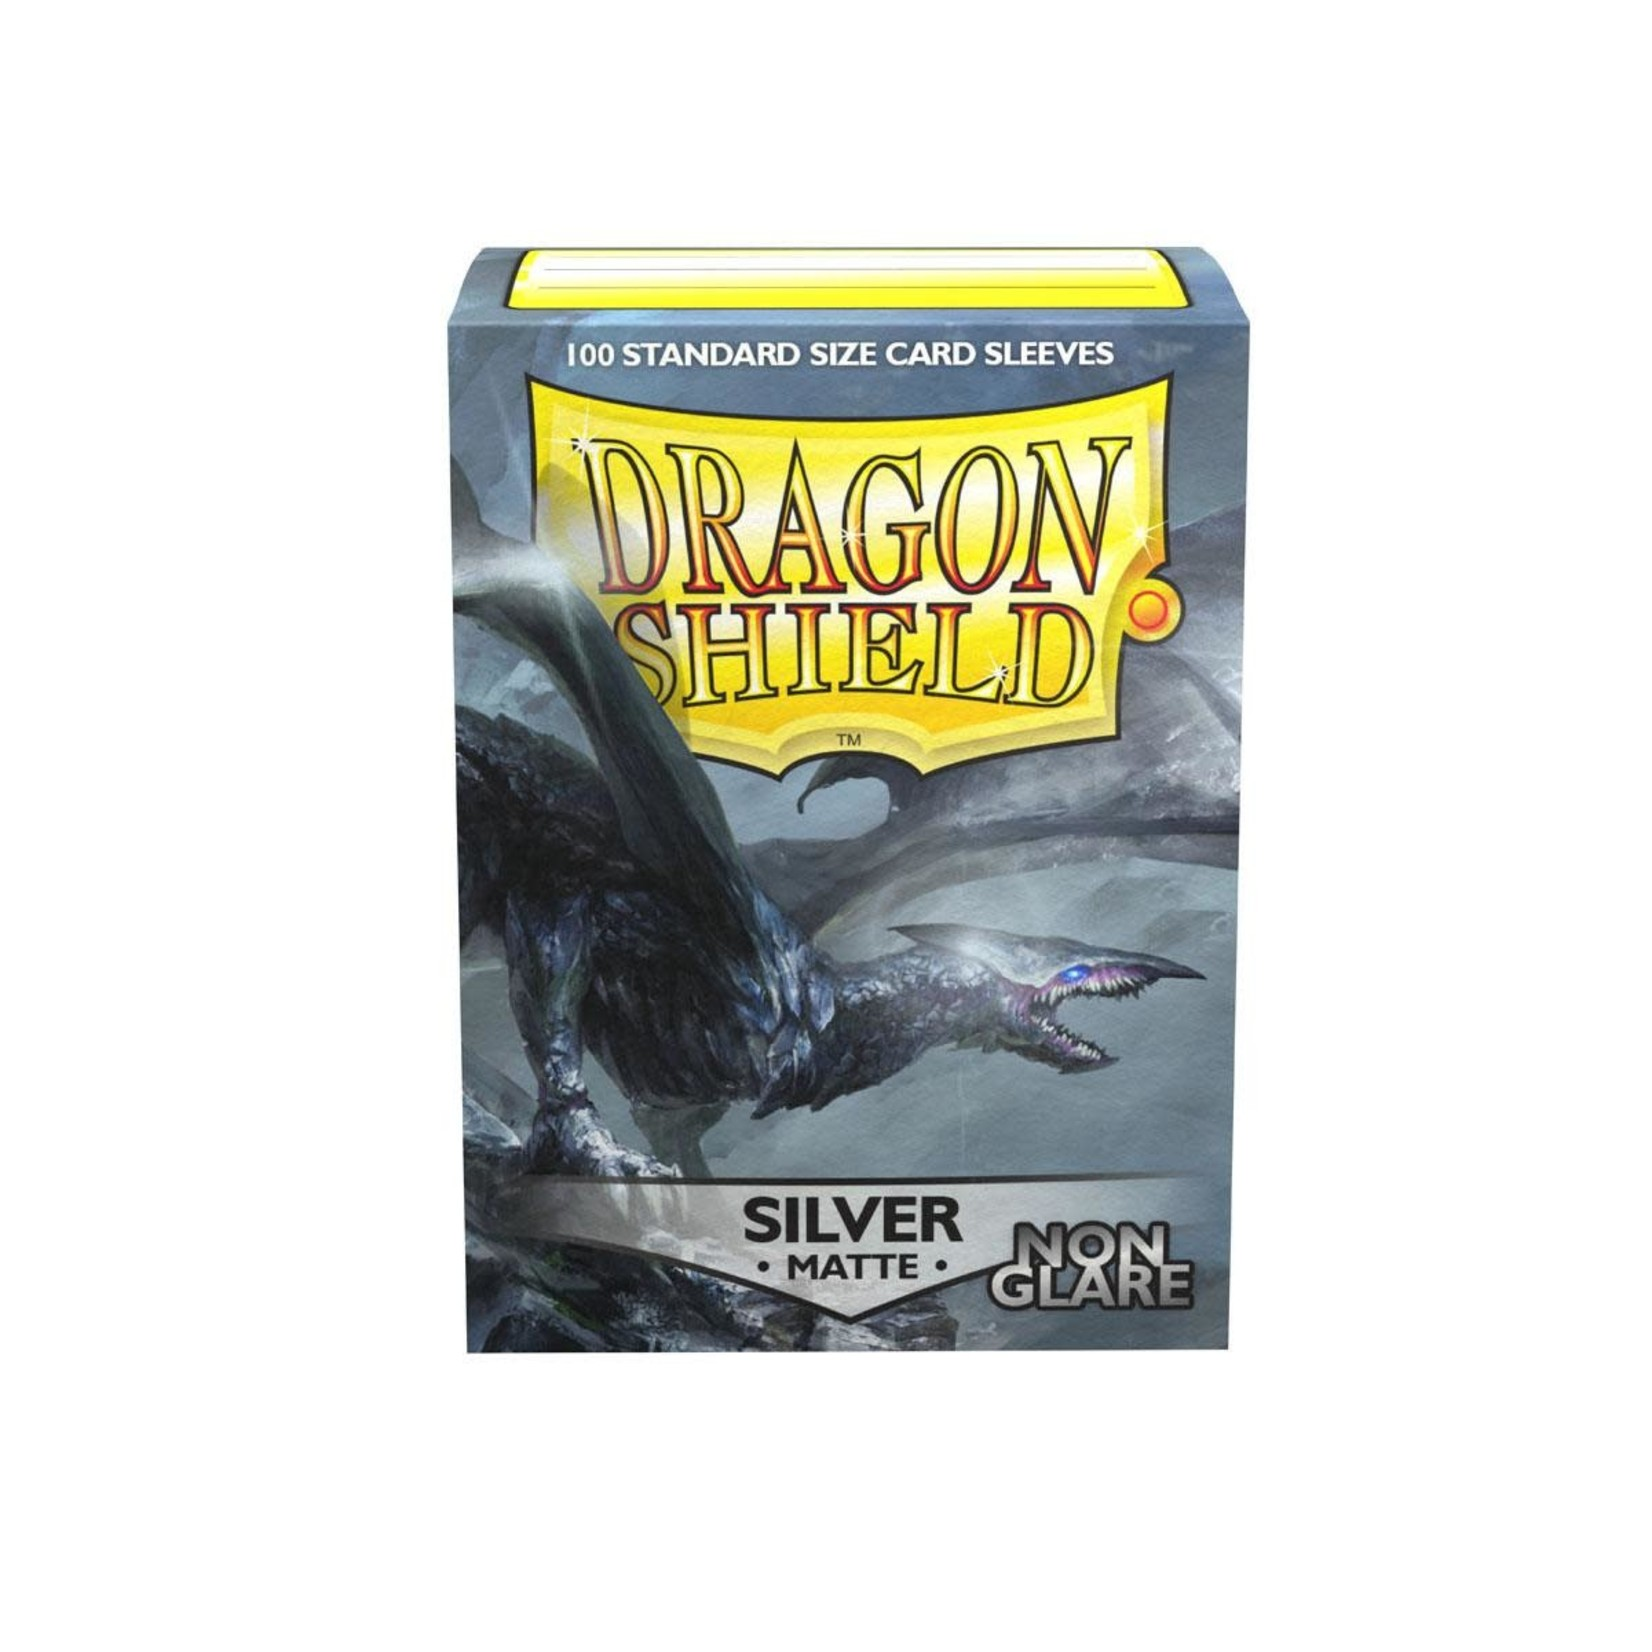 Arcane Tinman Dragon Shields: Cards Sleeves -  Non Glare SilverMatte (100)